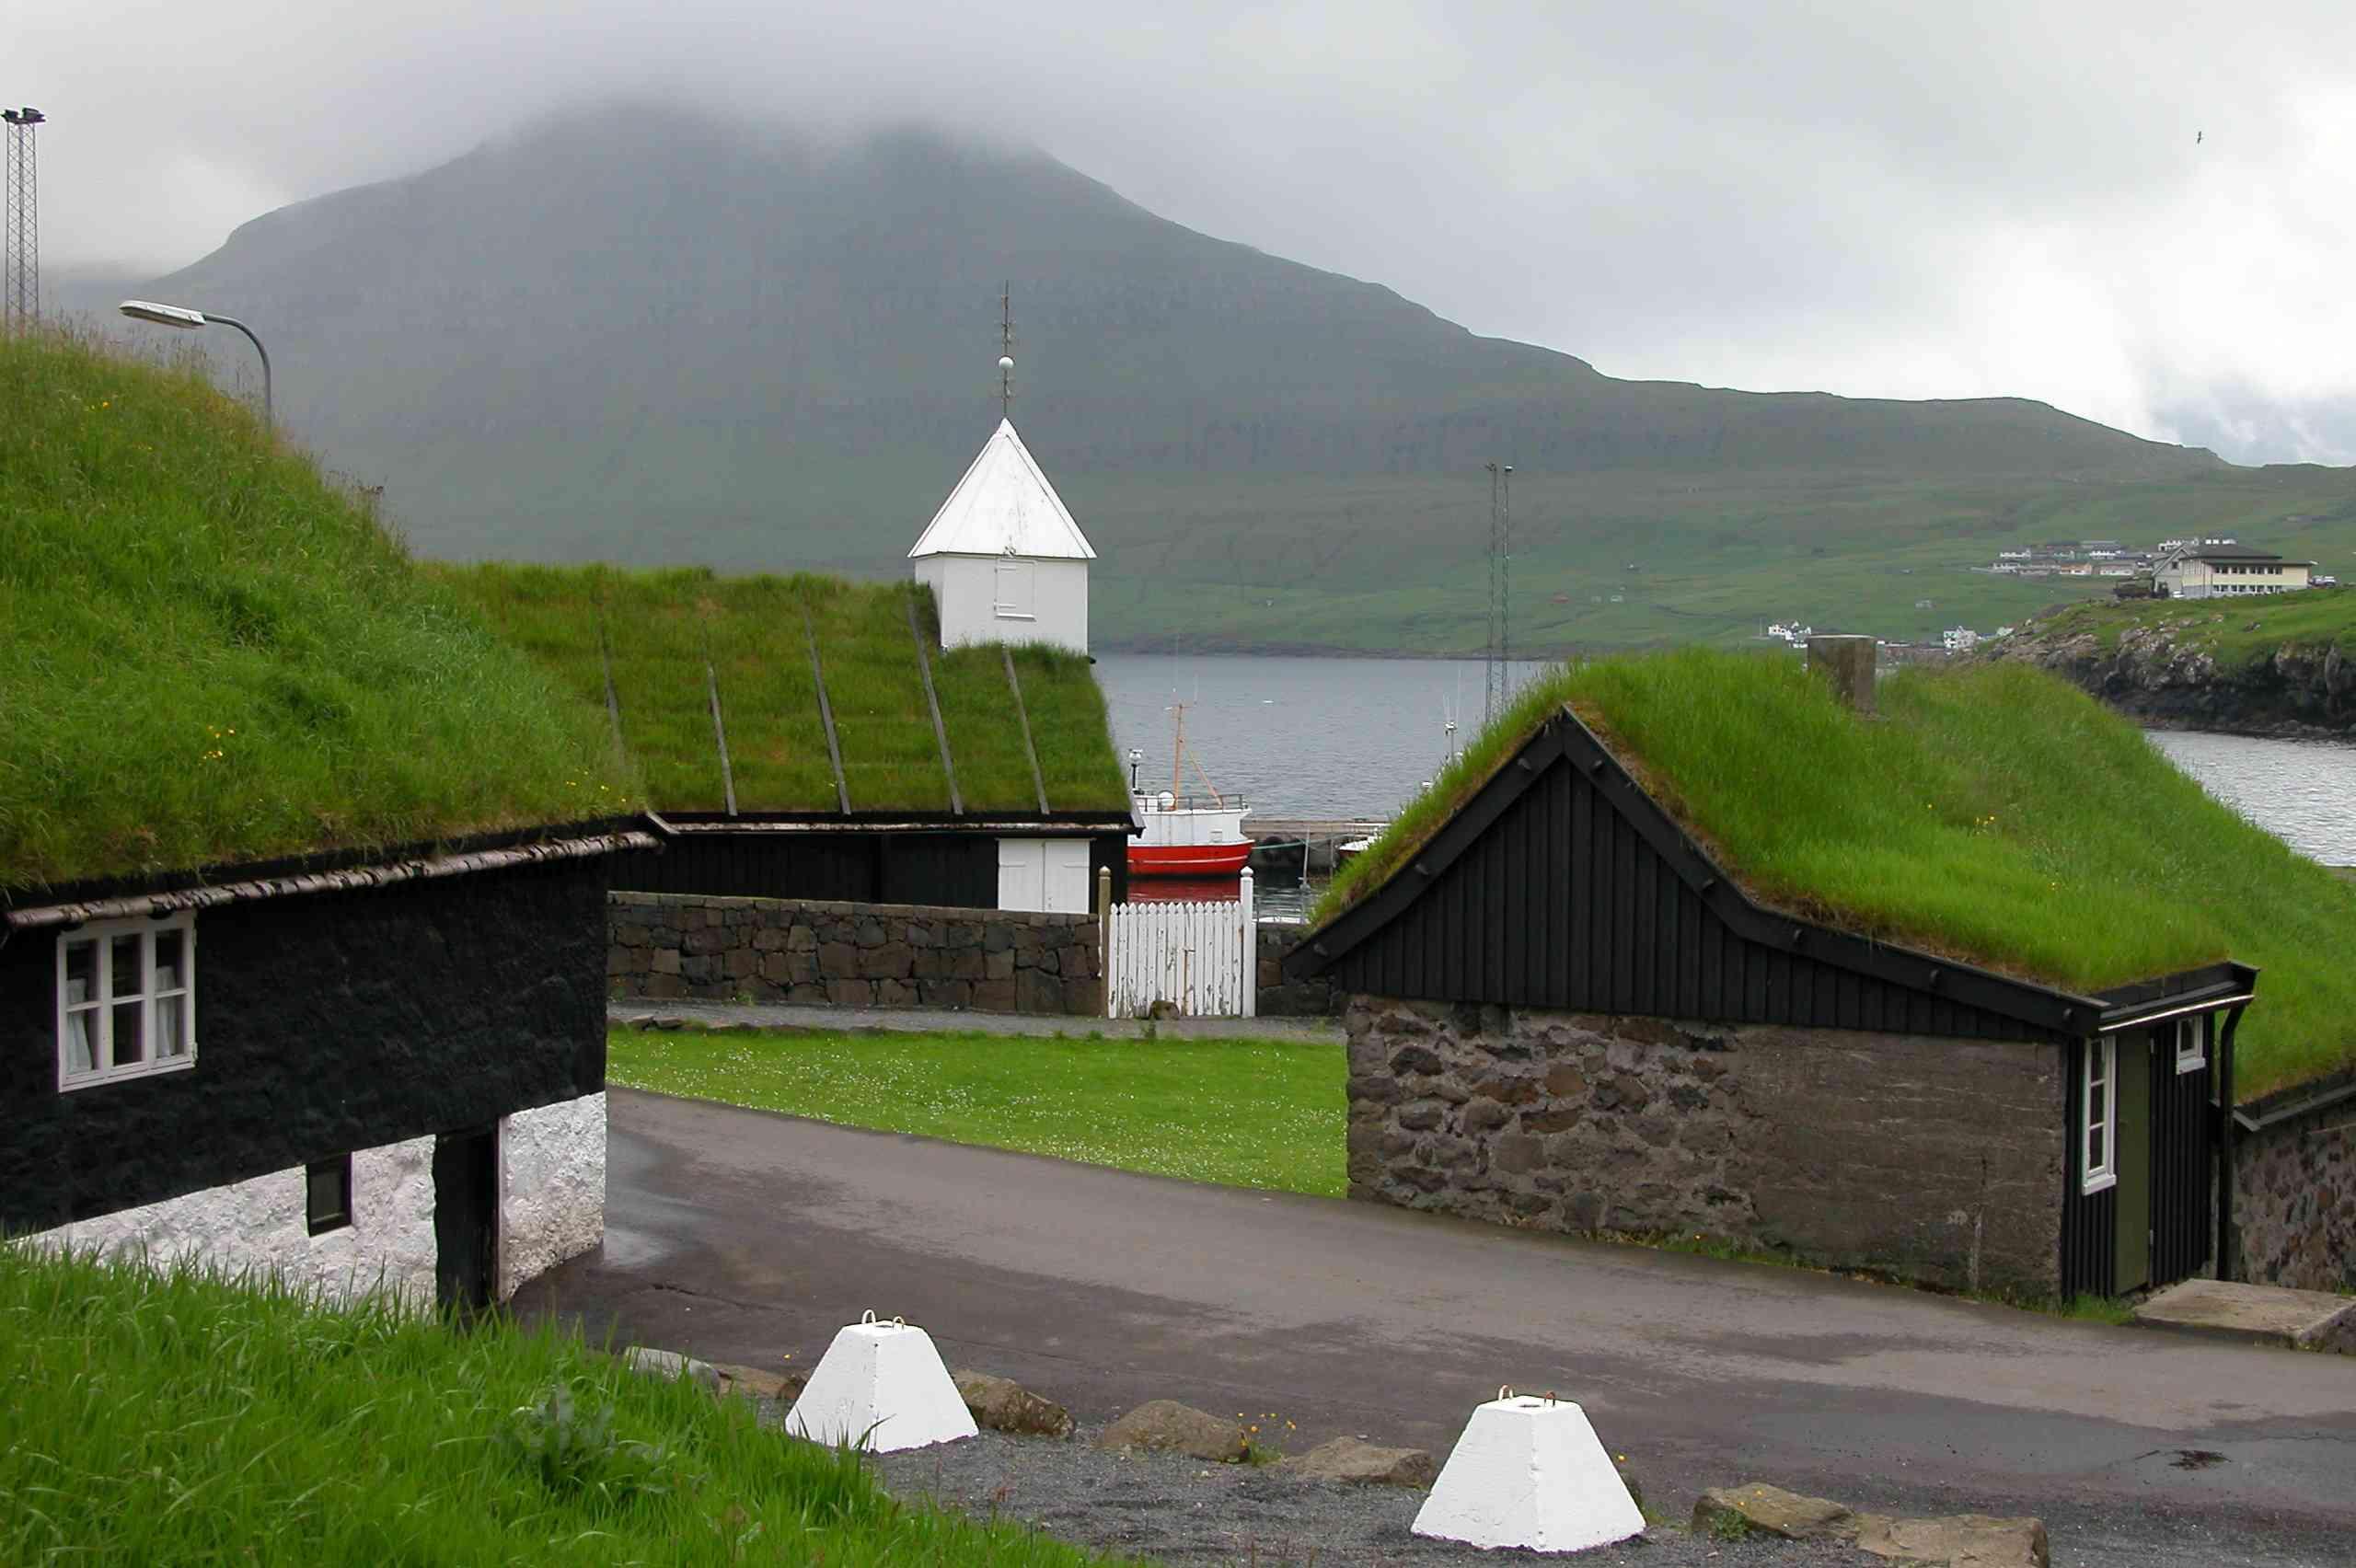 Traditional buildings with green roofs at Norðragøta on Eysturoy, Faroe Islands